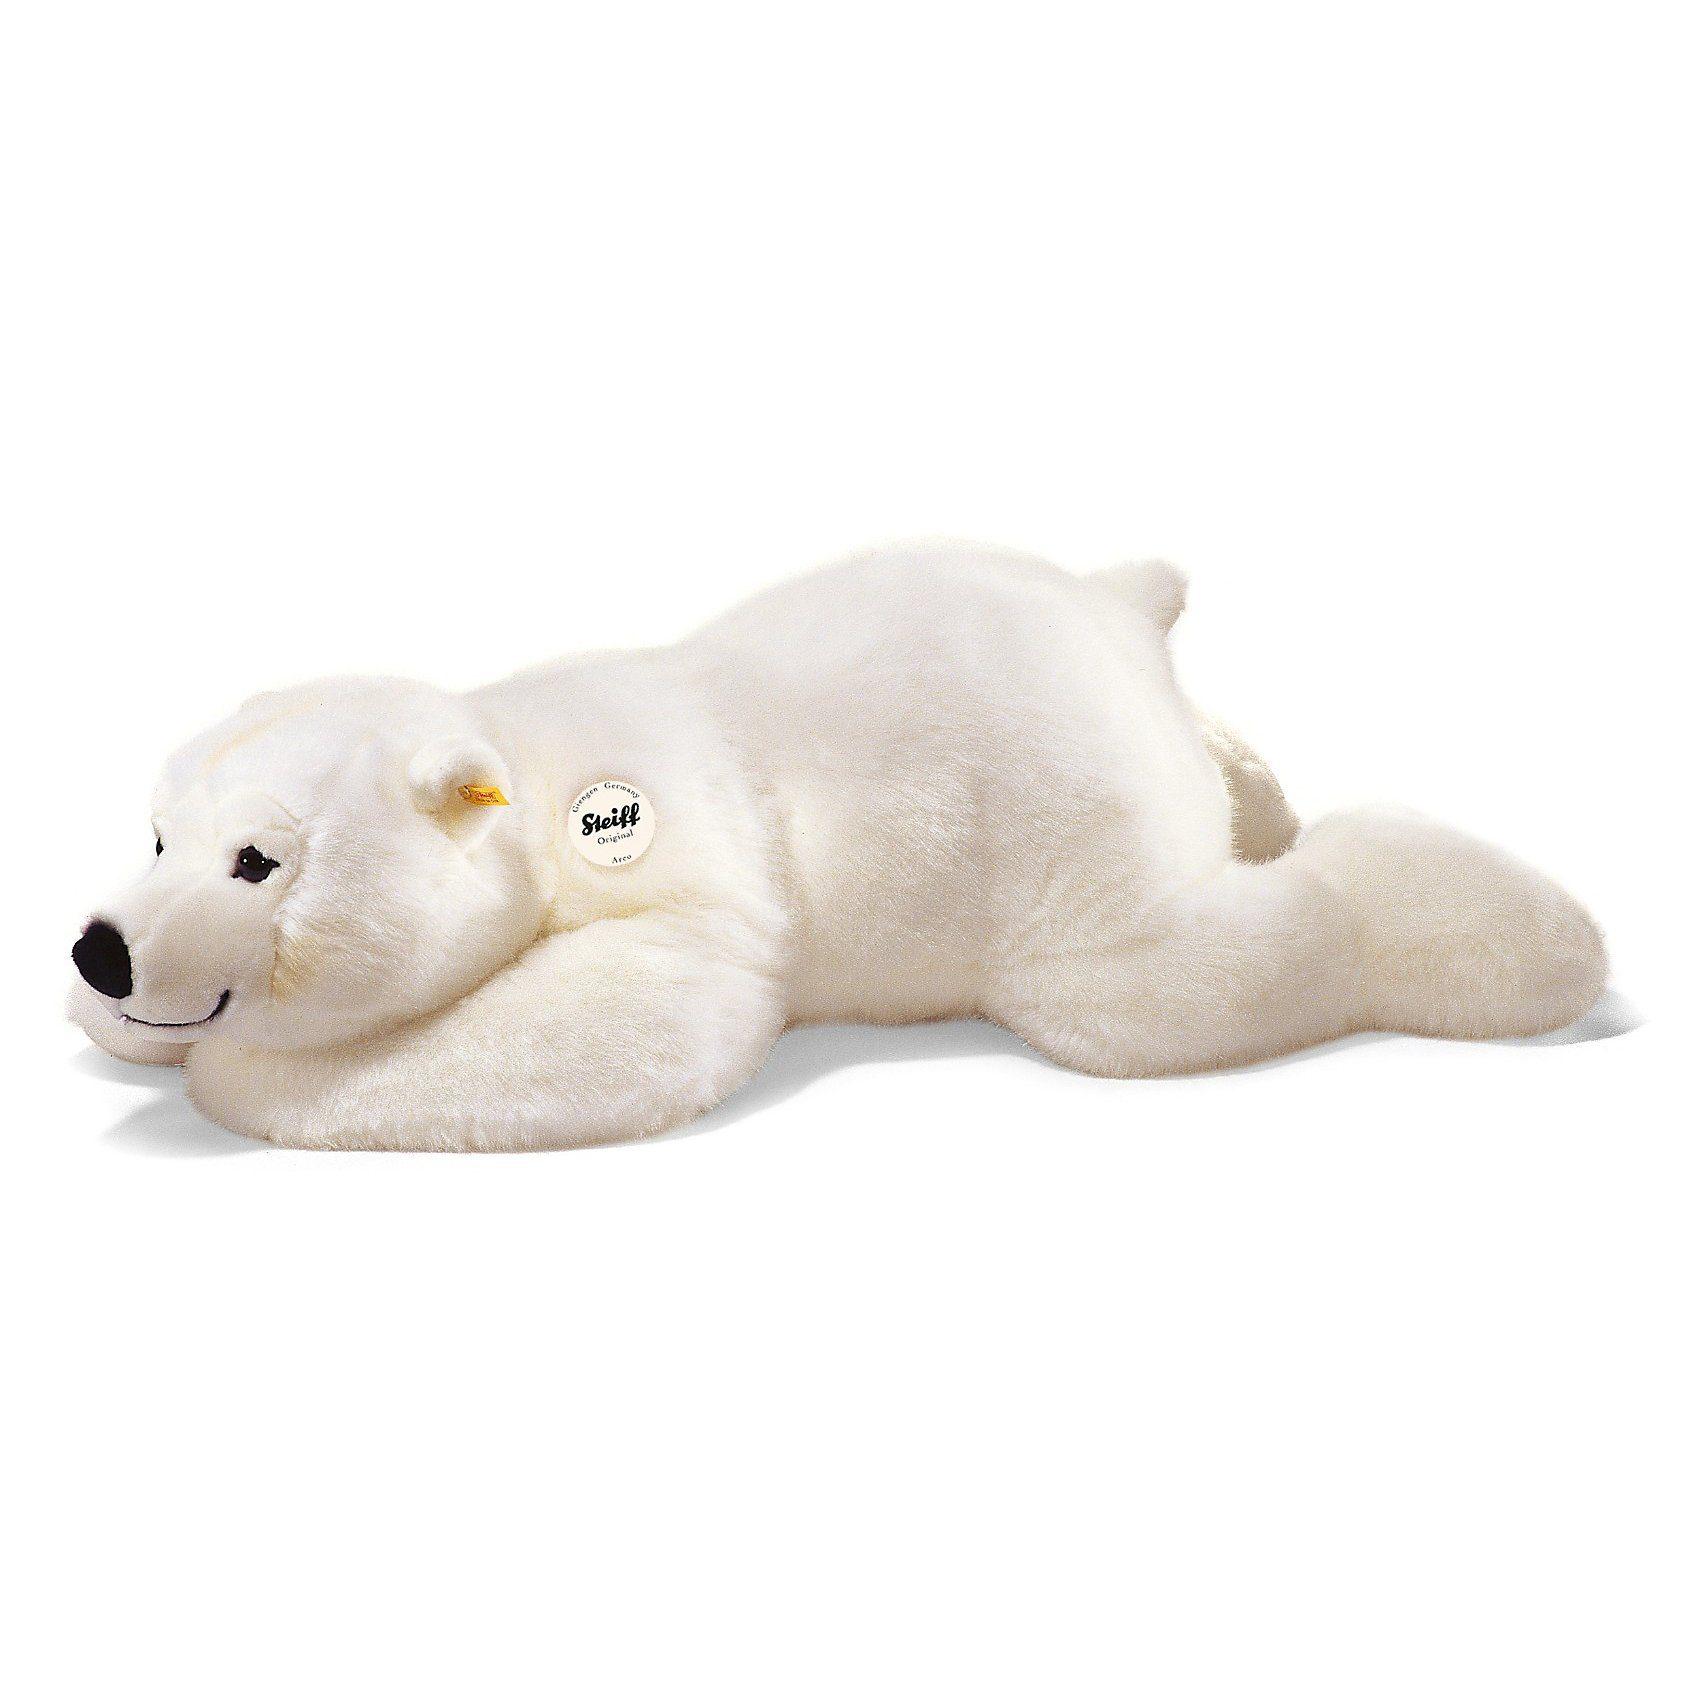 Steiff Arco Eisbär weiß 45 cm